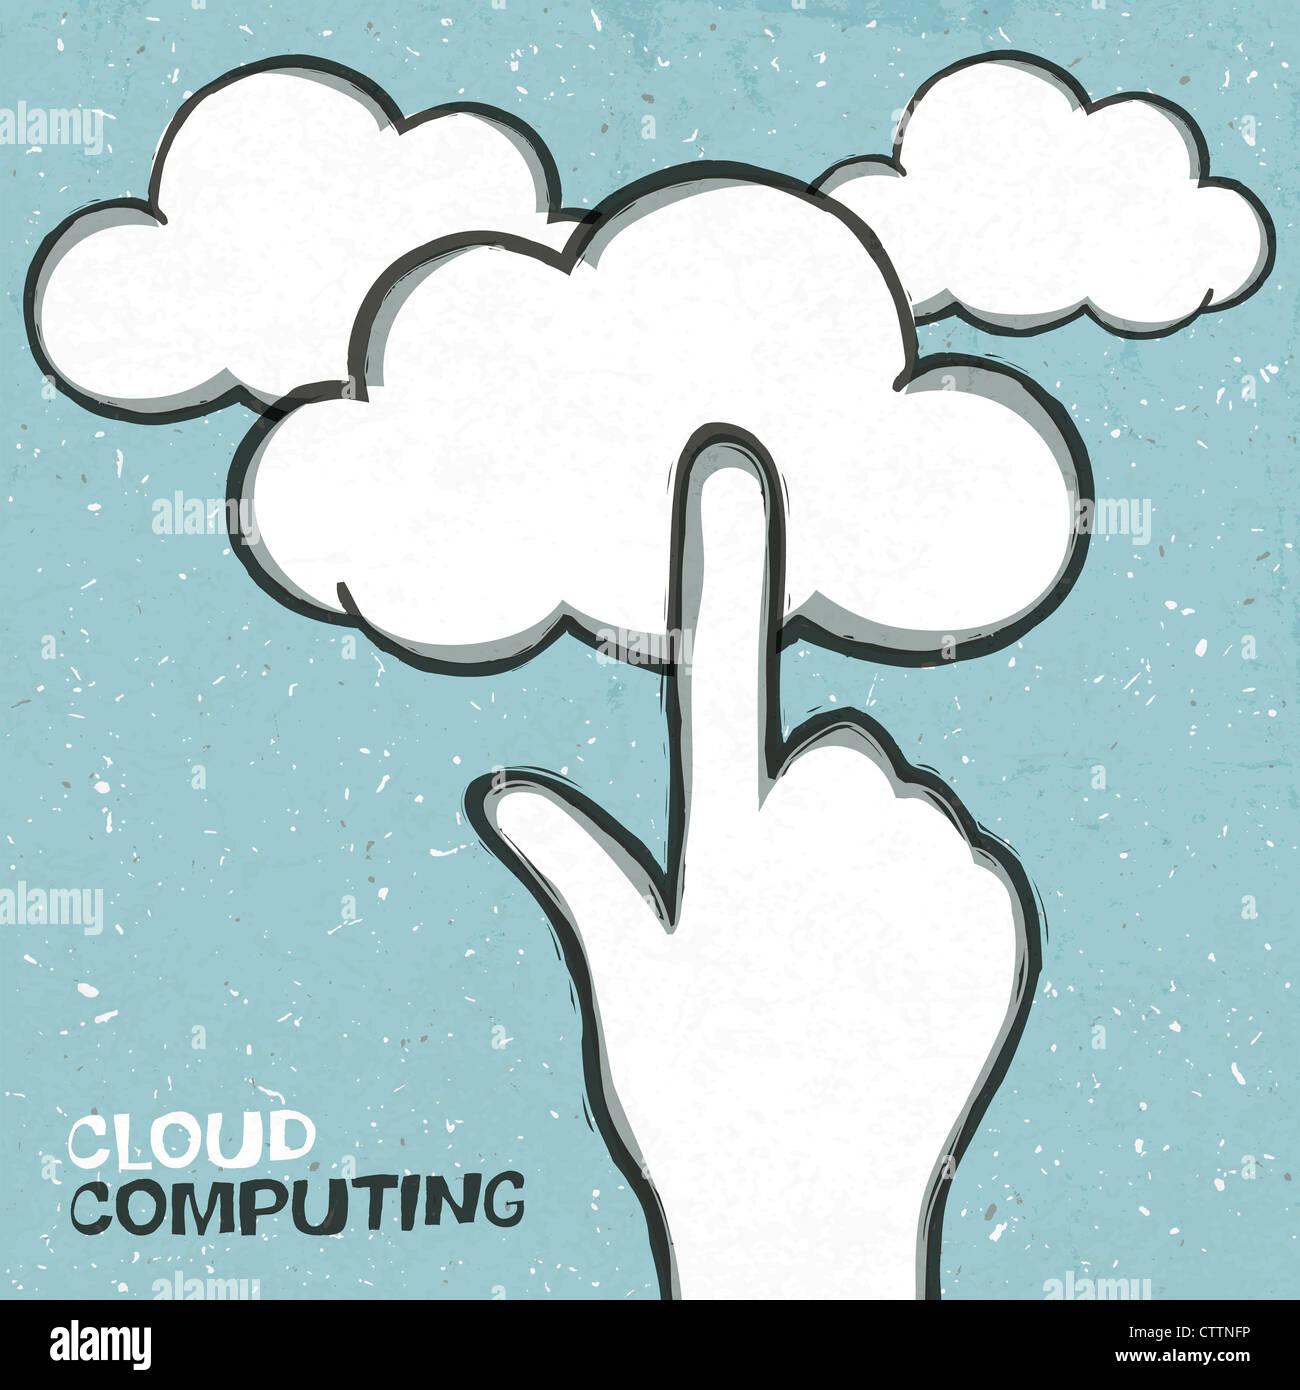 Cloud-computing-Konzept Abbildung Stockbild